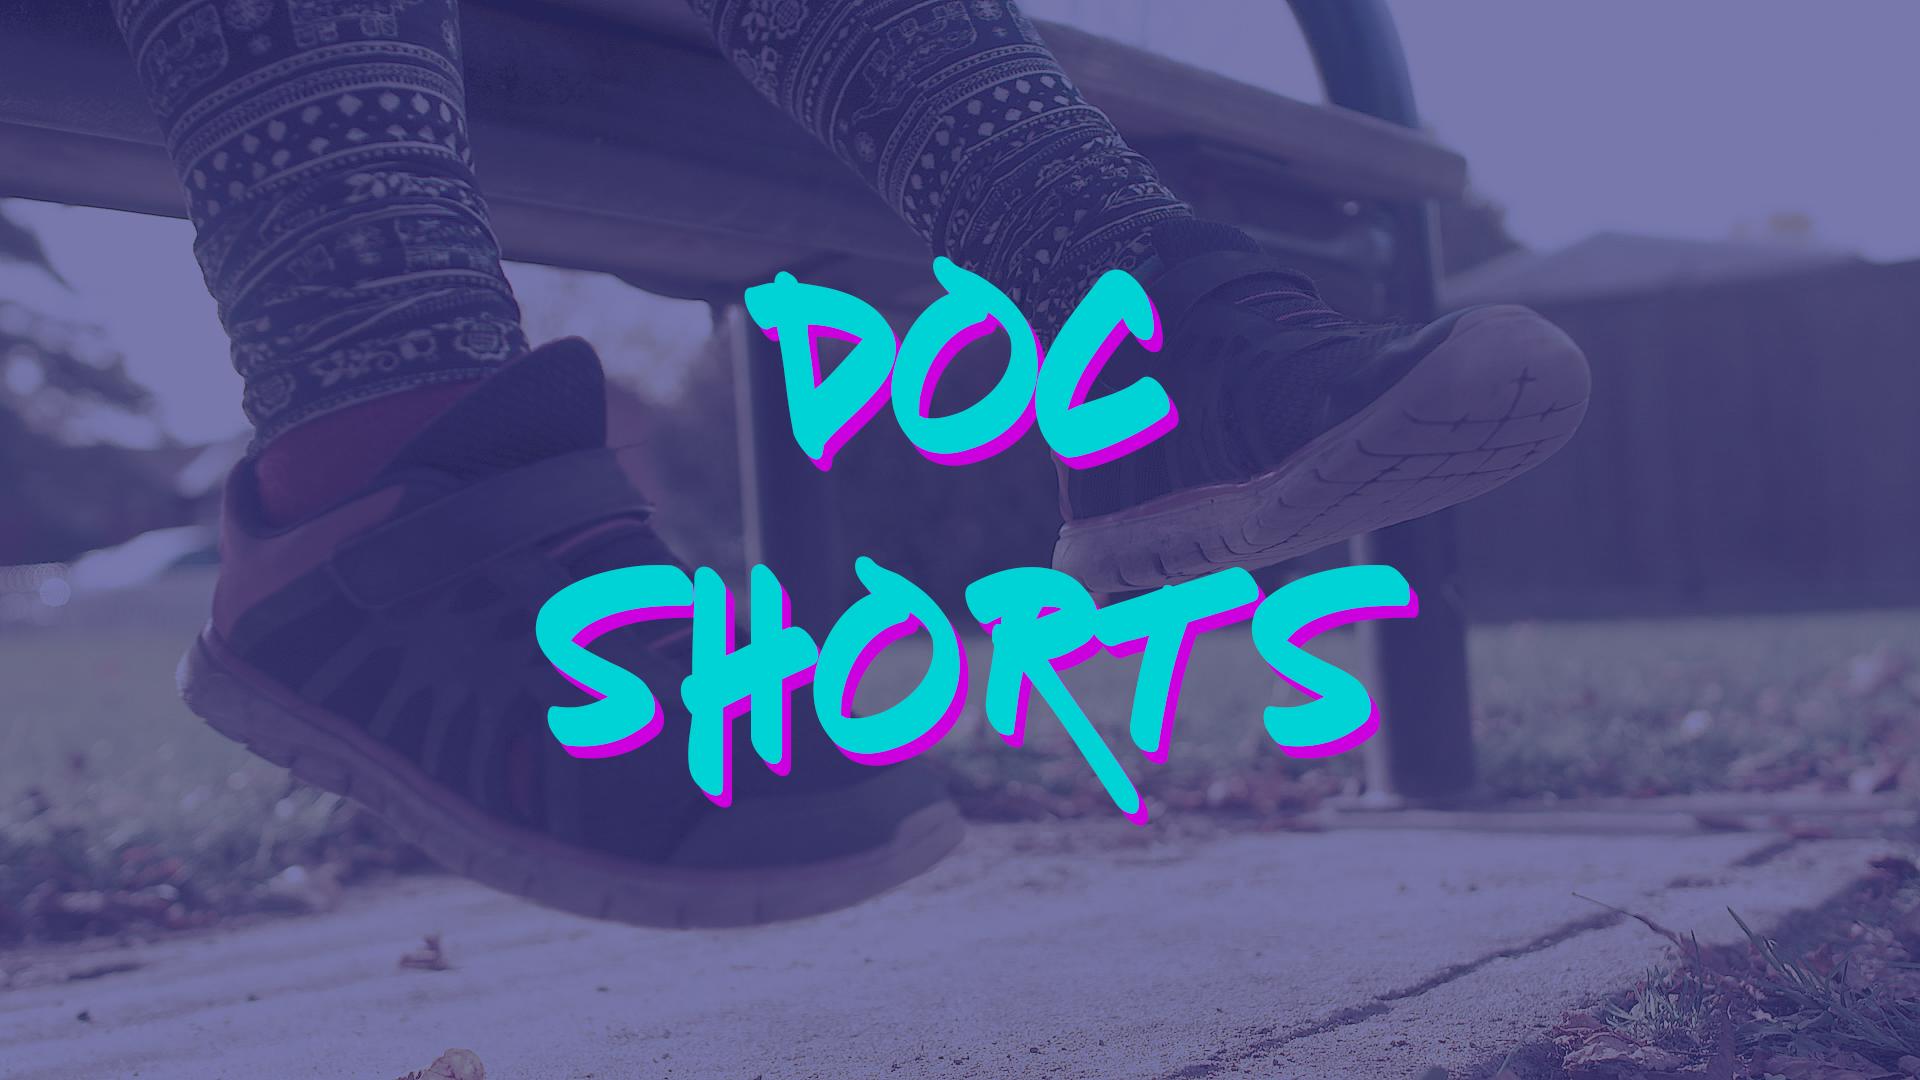 DocShorts.png